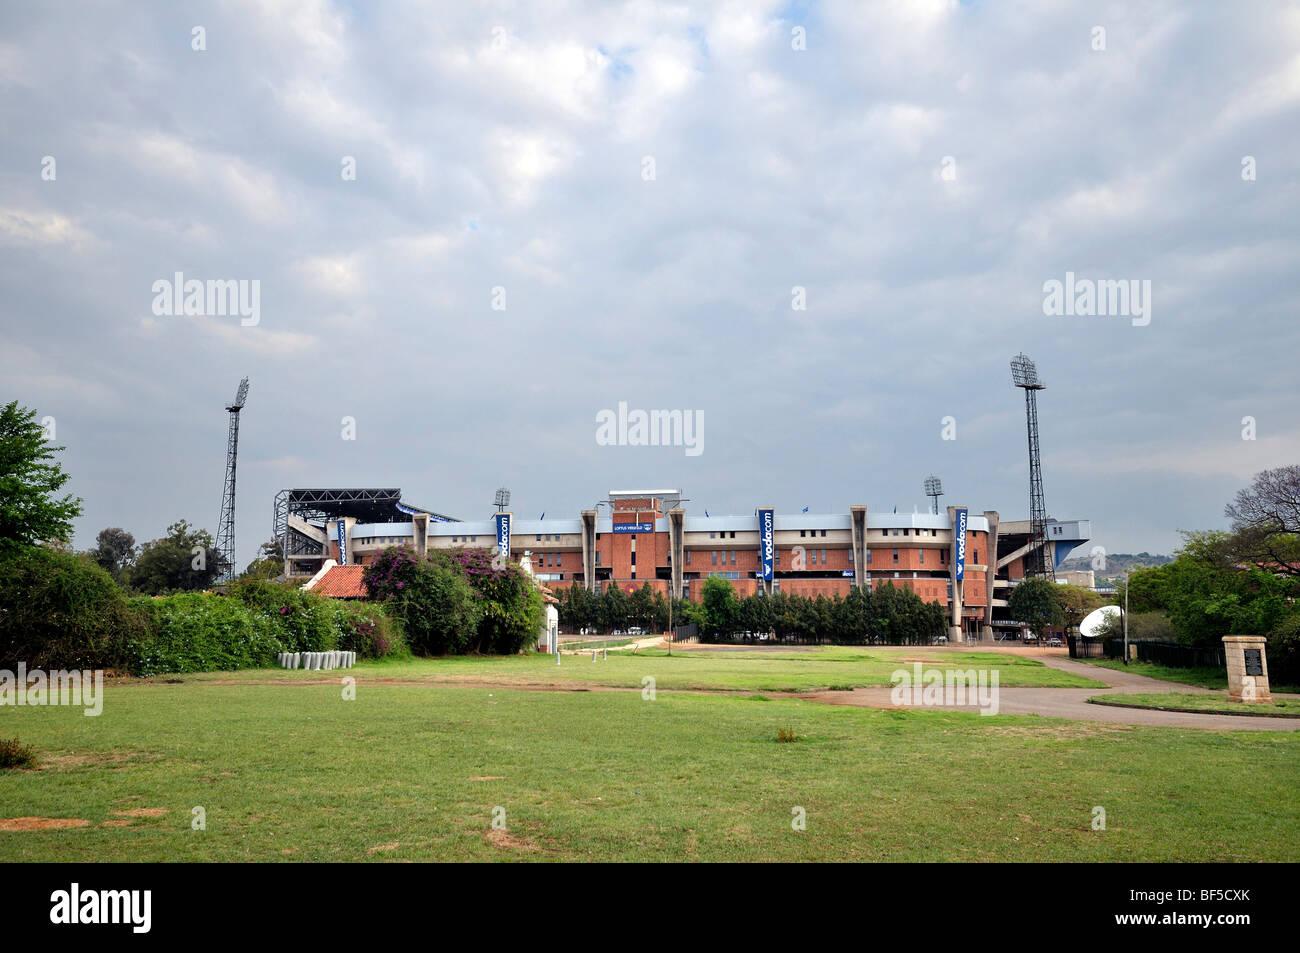 2010 FIFA World Cup, Loftus Versfeld Stadium, Pretoria, South Africa, Africa - Stock Image